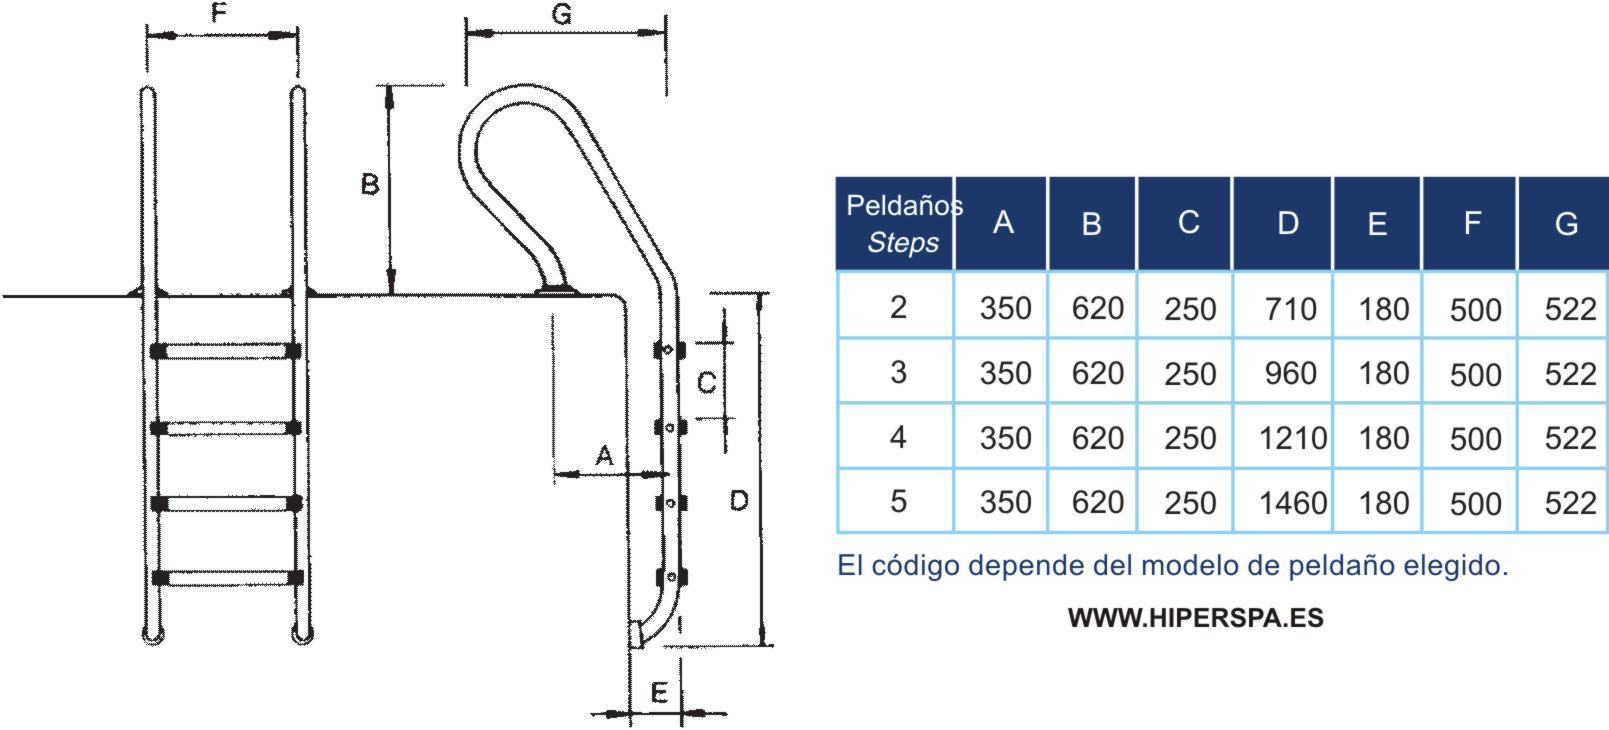 escalera_acero_inoxidable_modelo_mixto